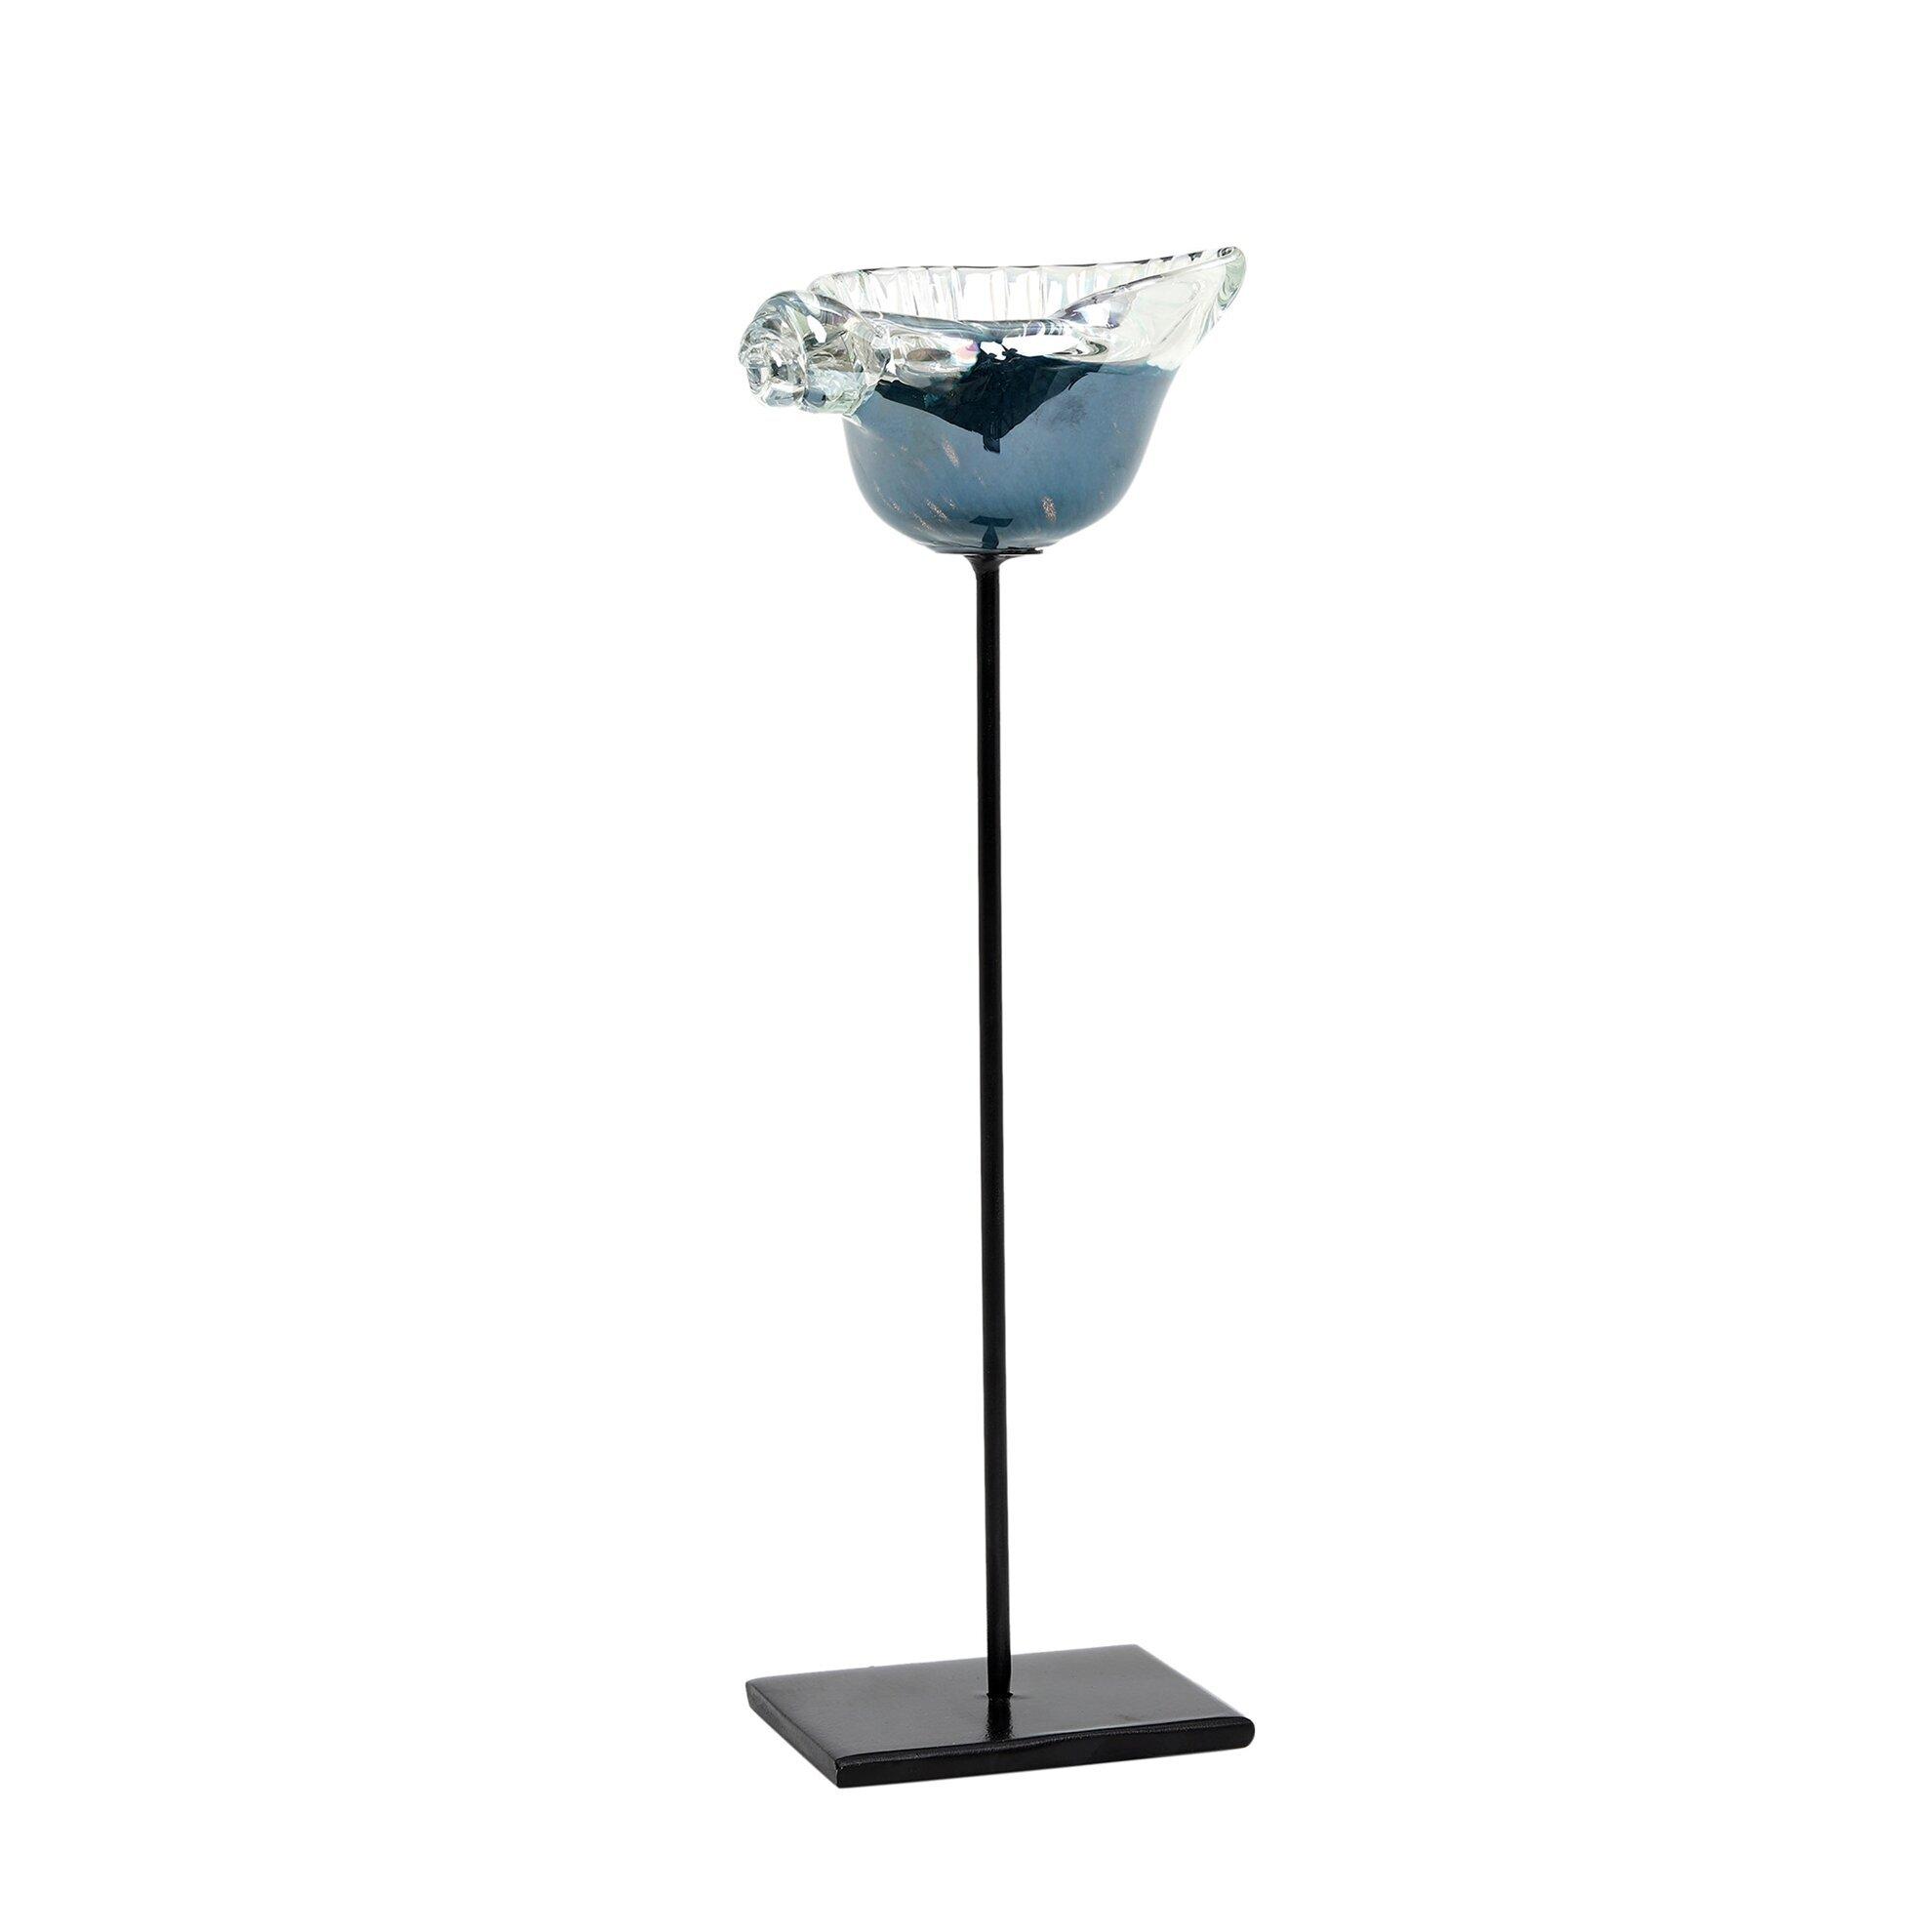 Dekoratif Obje - Deniz Kabuğu (8x11x27cm)